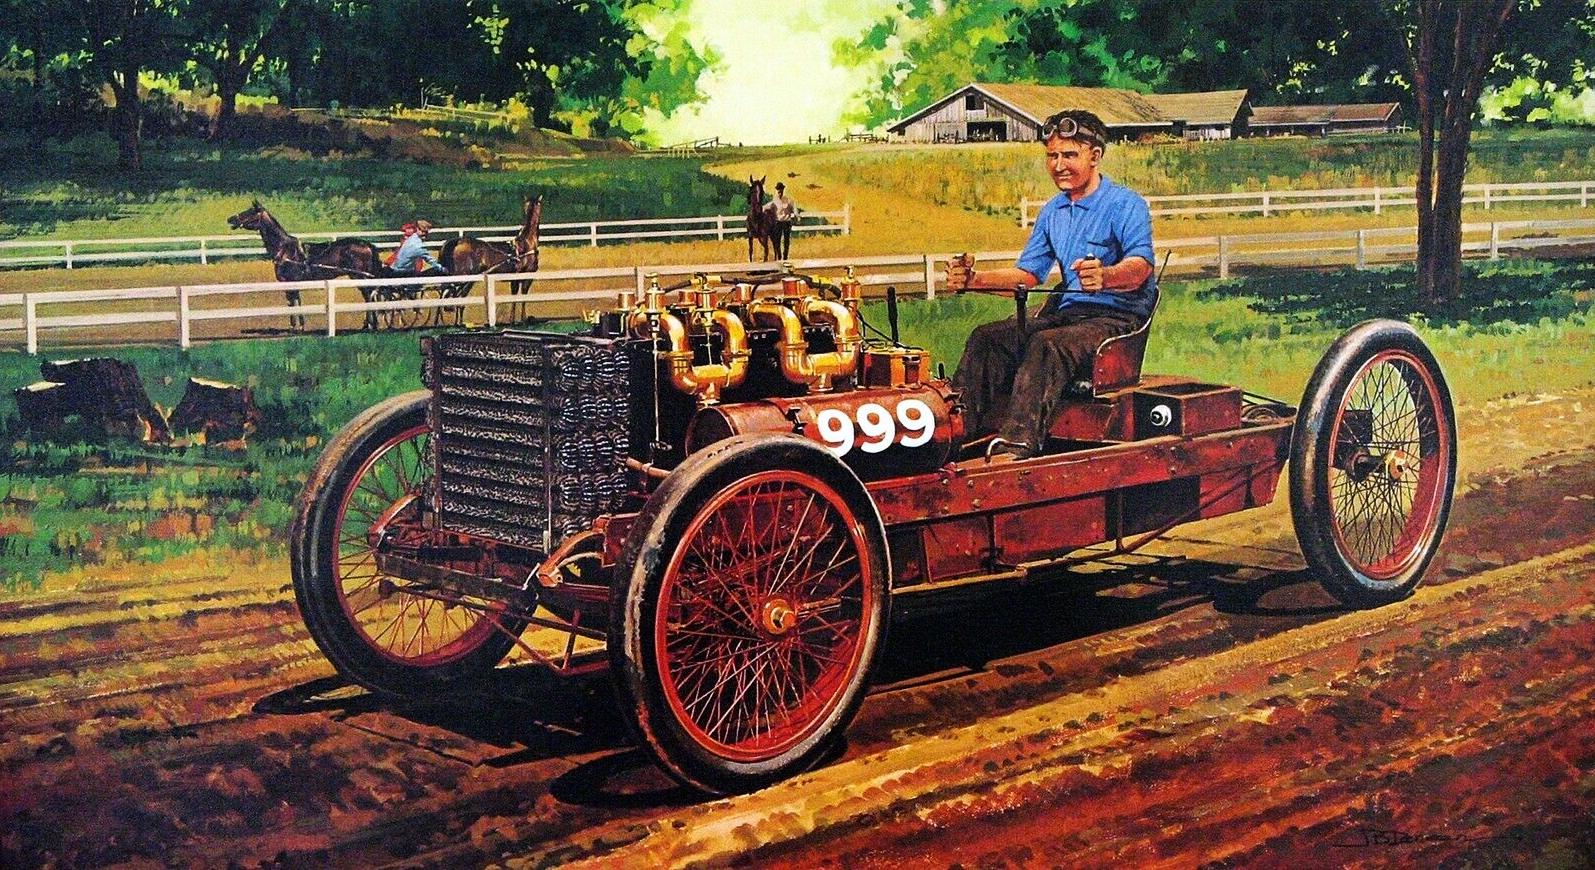 1902. 999 Racer. Illustrated by James B. Deneen